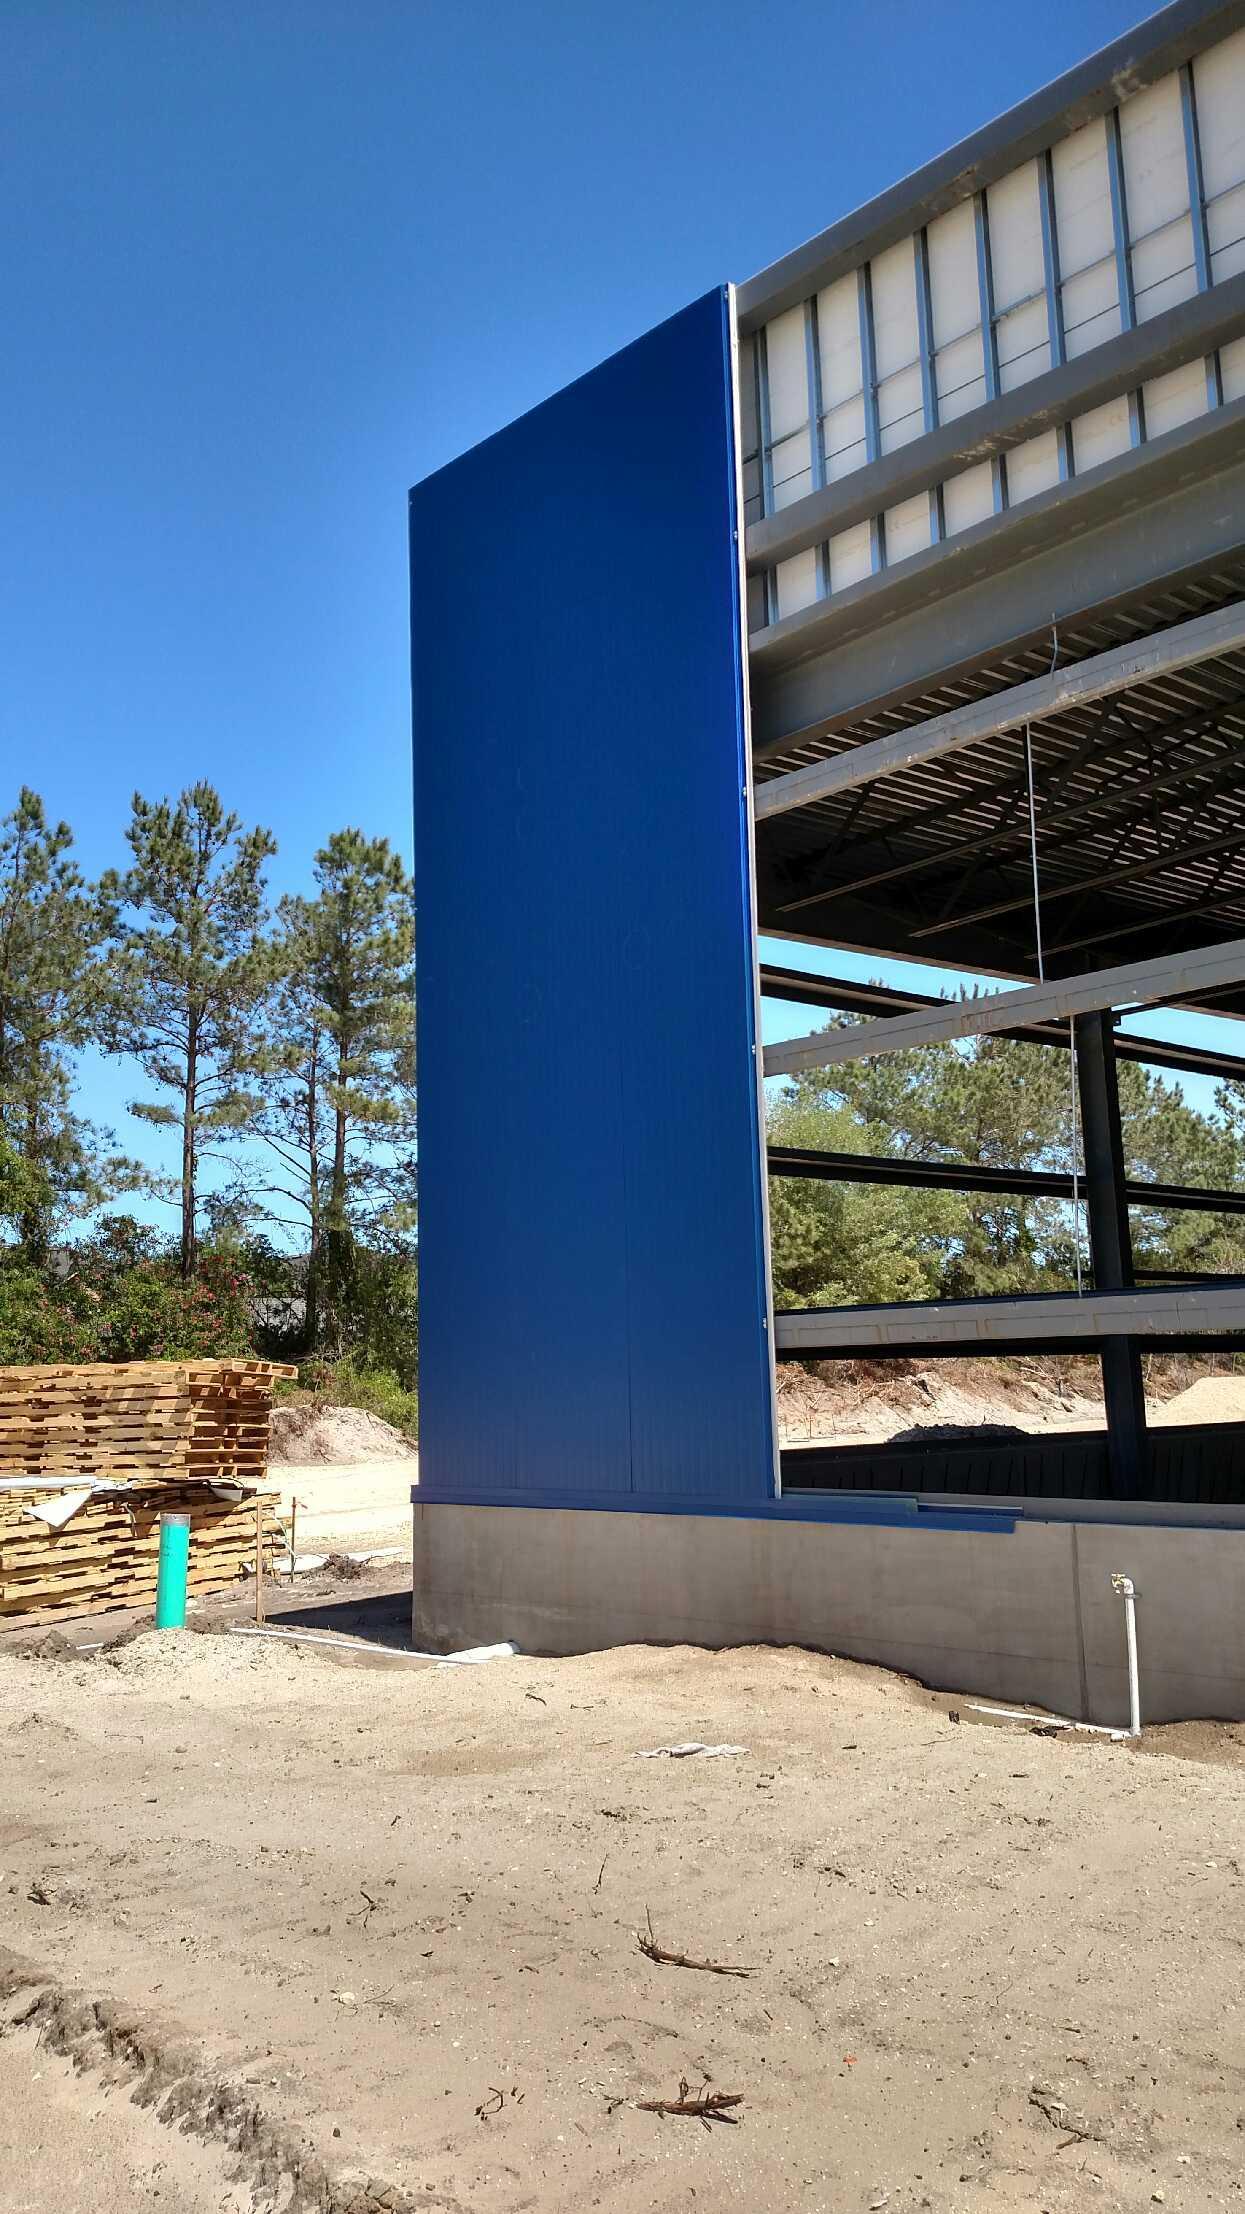 Ikea construction makes progress grand opening expected for Ikea jobs orlando fl